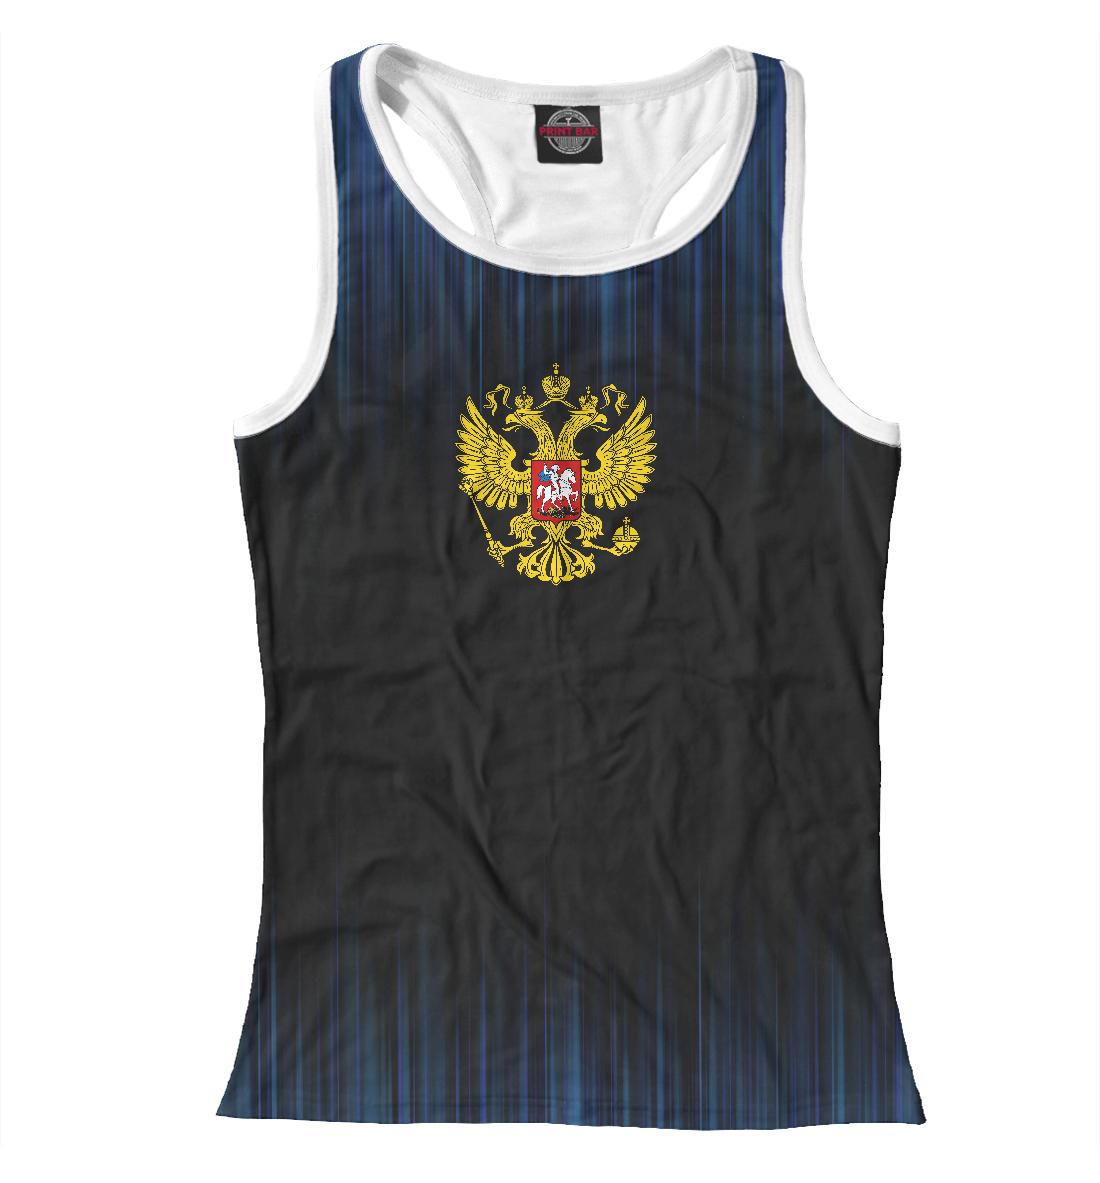 Купить Герб России, Printbar, Майки борцовки, SRF-323812-mayb-1